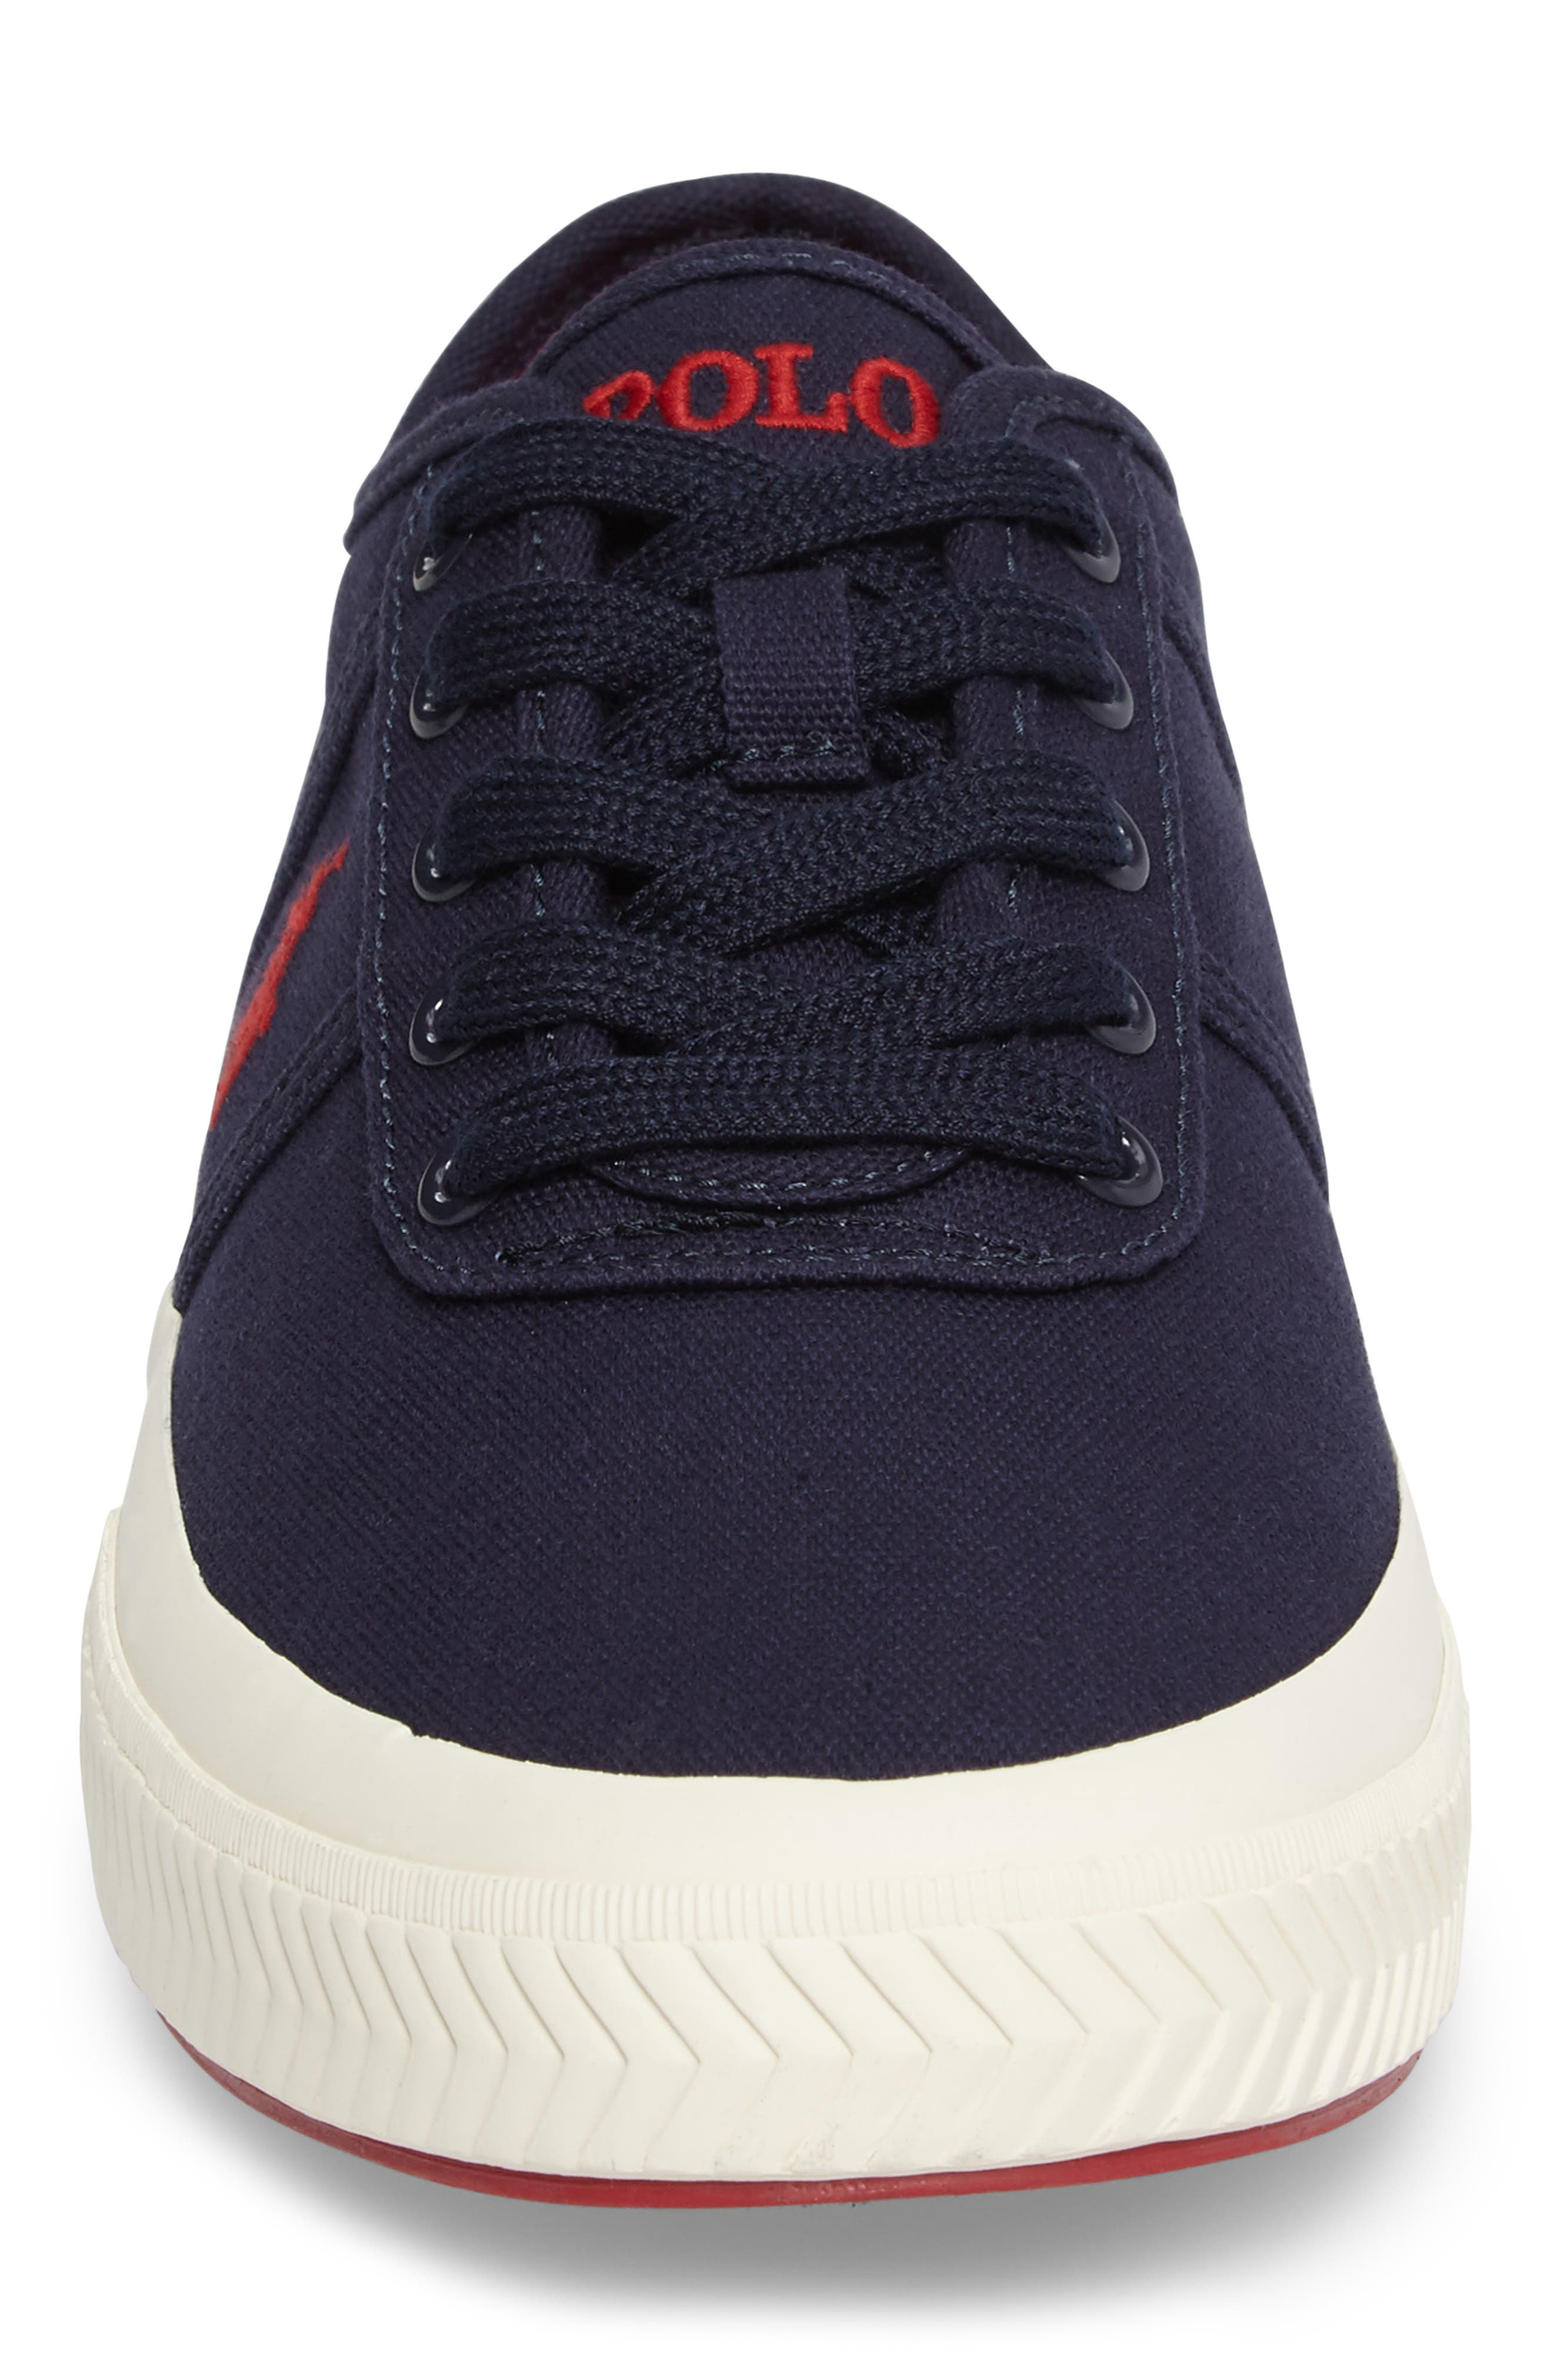 Polo Ralph Lauren Tyrian Sneaker,                             Alternate thumbnail 4, color,                             Newport Navy